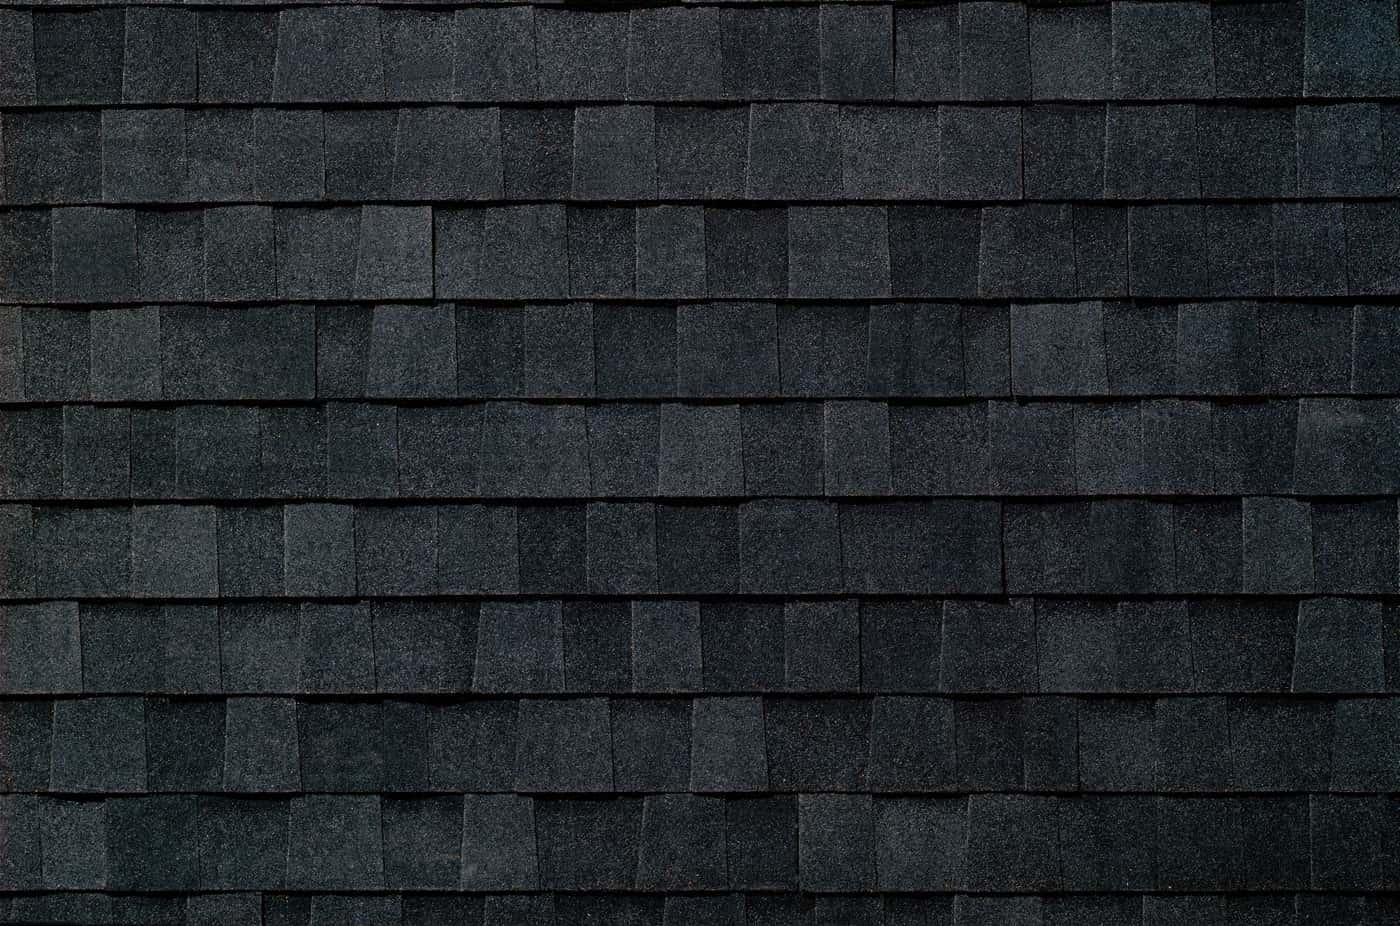 Heritage Rustic Black